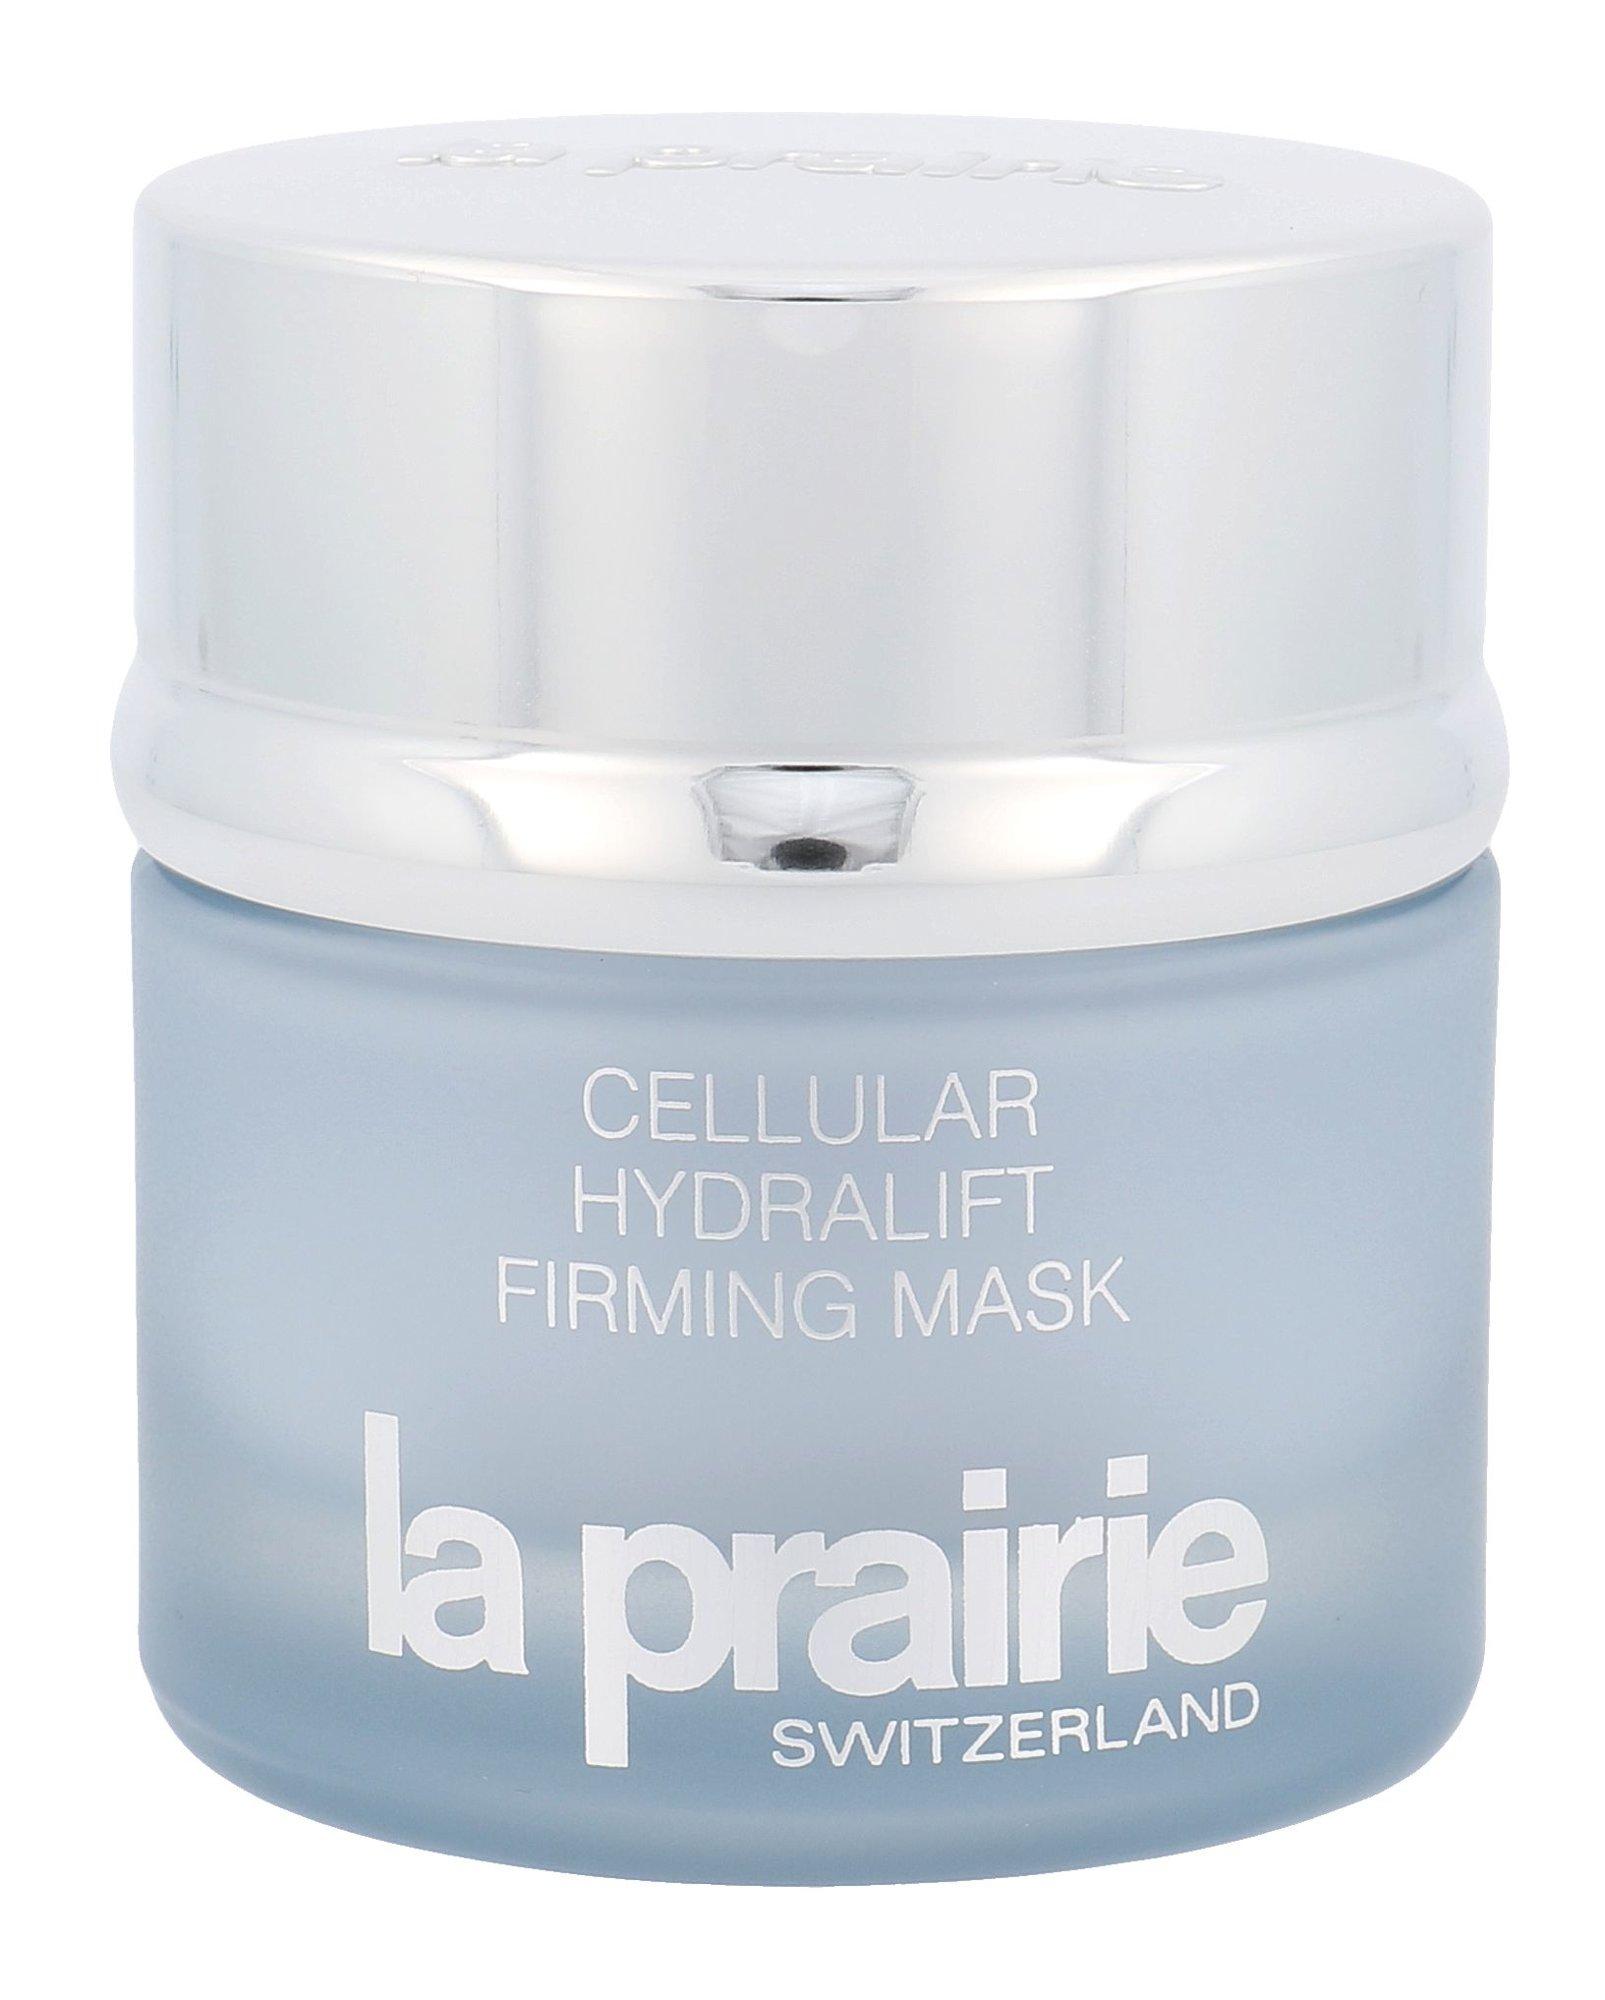 La Prairie Cellular Hydralift Firming Mask Cosmetic 50ml